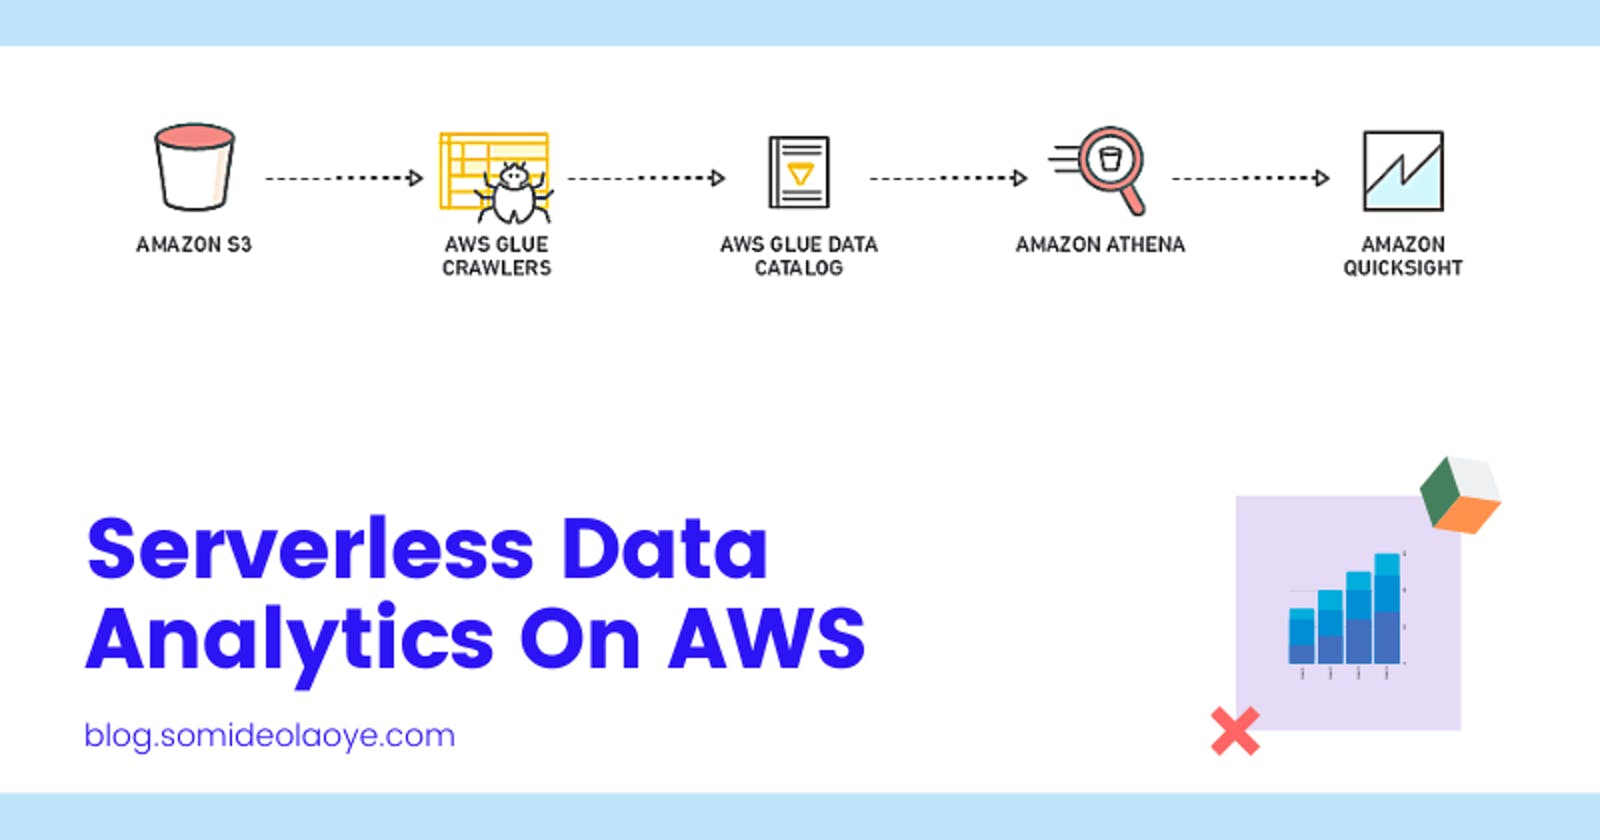 Serverless Data Analytics On AWS (QuickSight + Athena + Glue + S3 Data Lake)